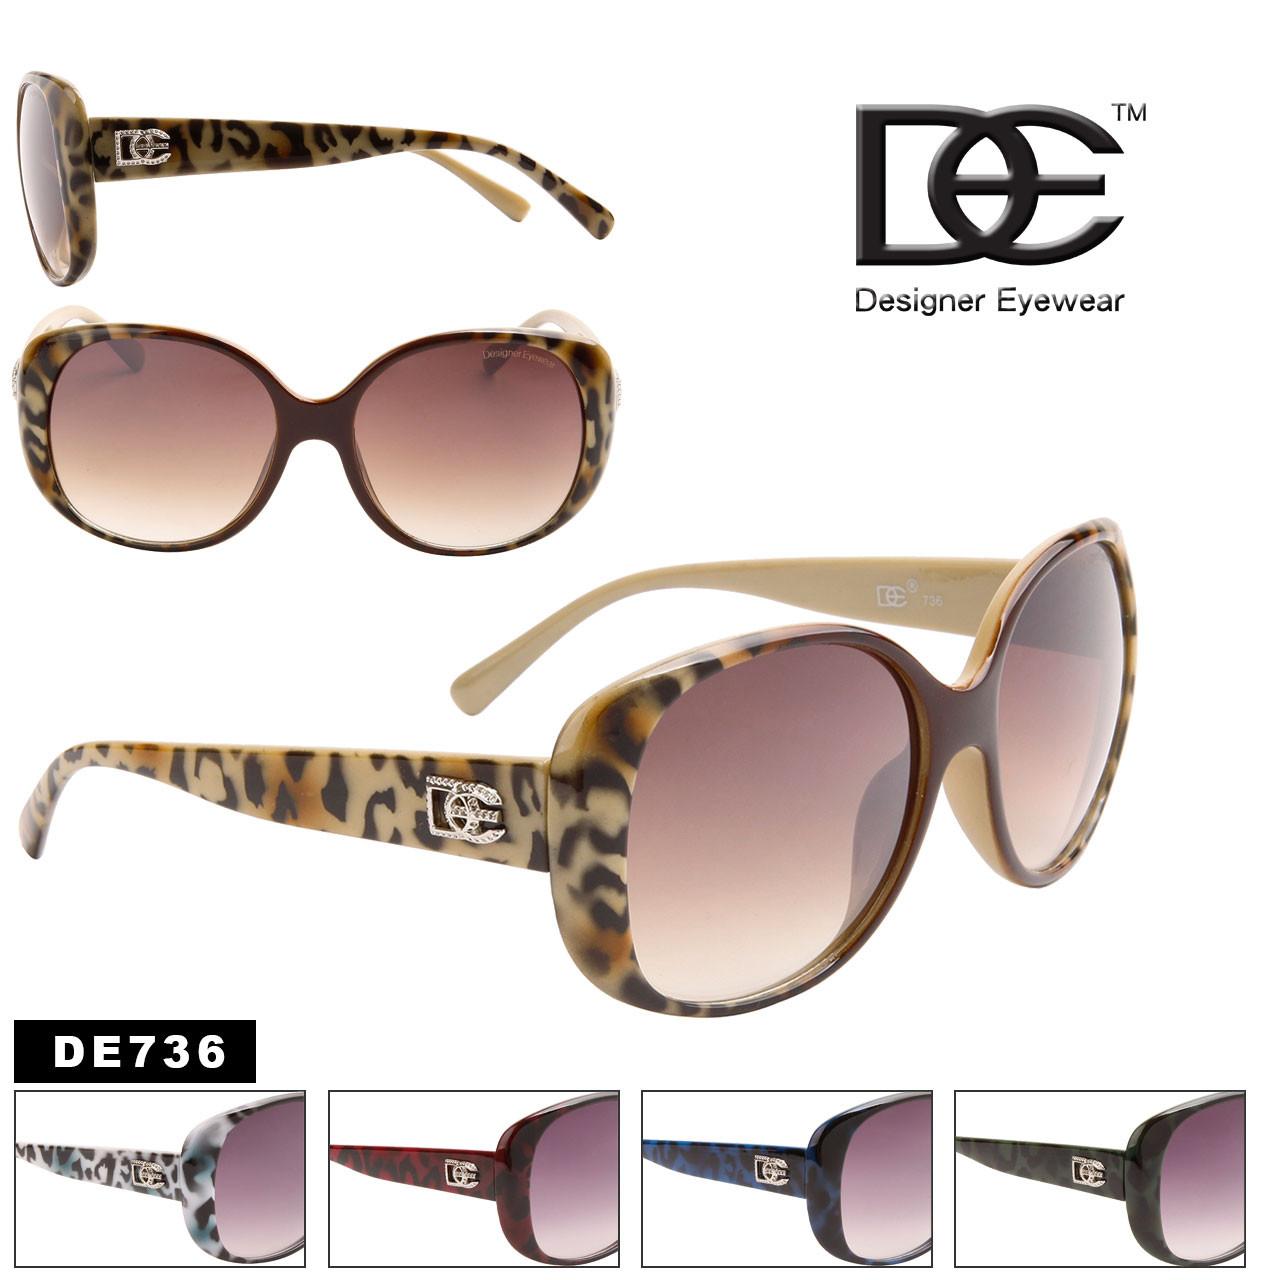 DE™ Wholesale Designer Sunglasses - Style #DE736